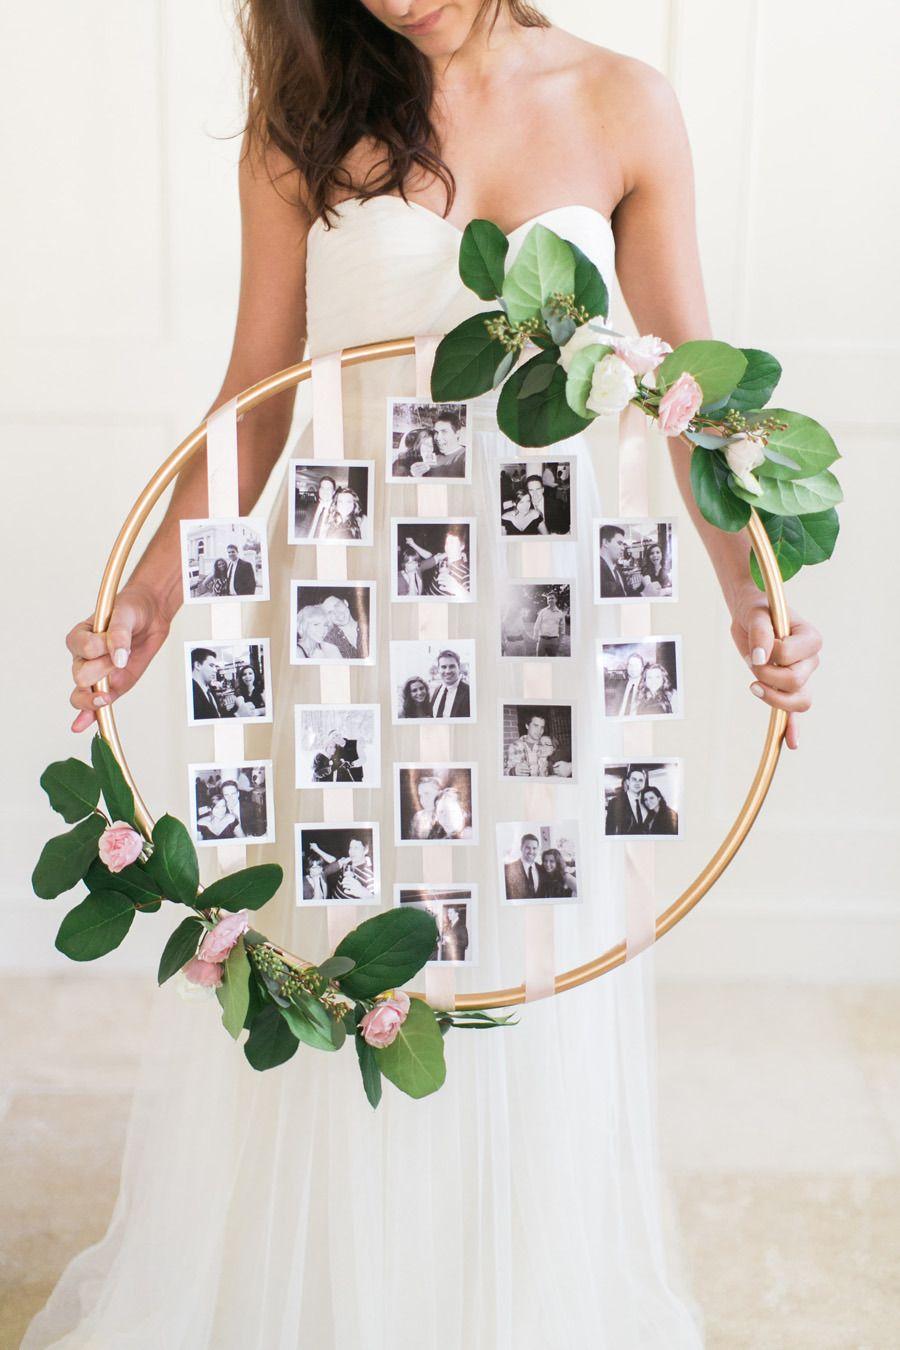 Diy floral photo hoop craft ideas pinterest wedding diy